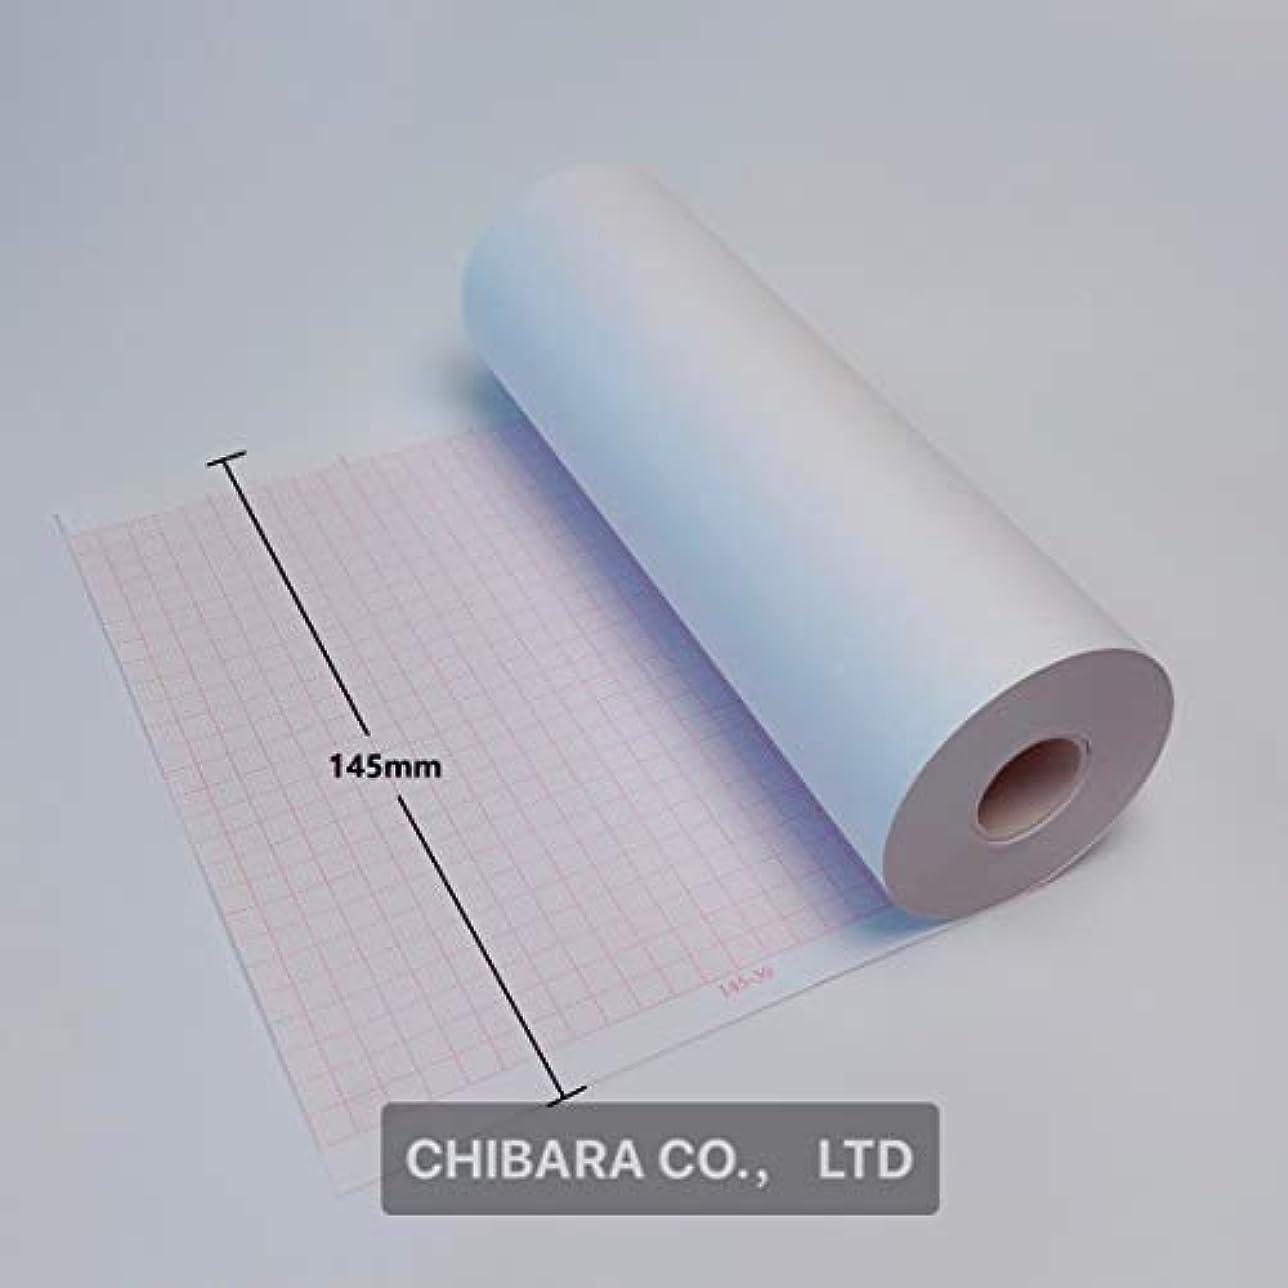 ミント変更可能順番心電図記録紙 幅145mm×長30m(ロール型) CP-145(5巻入)